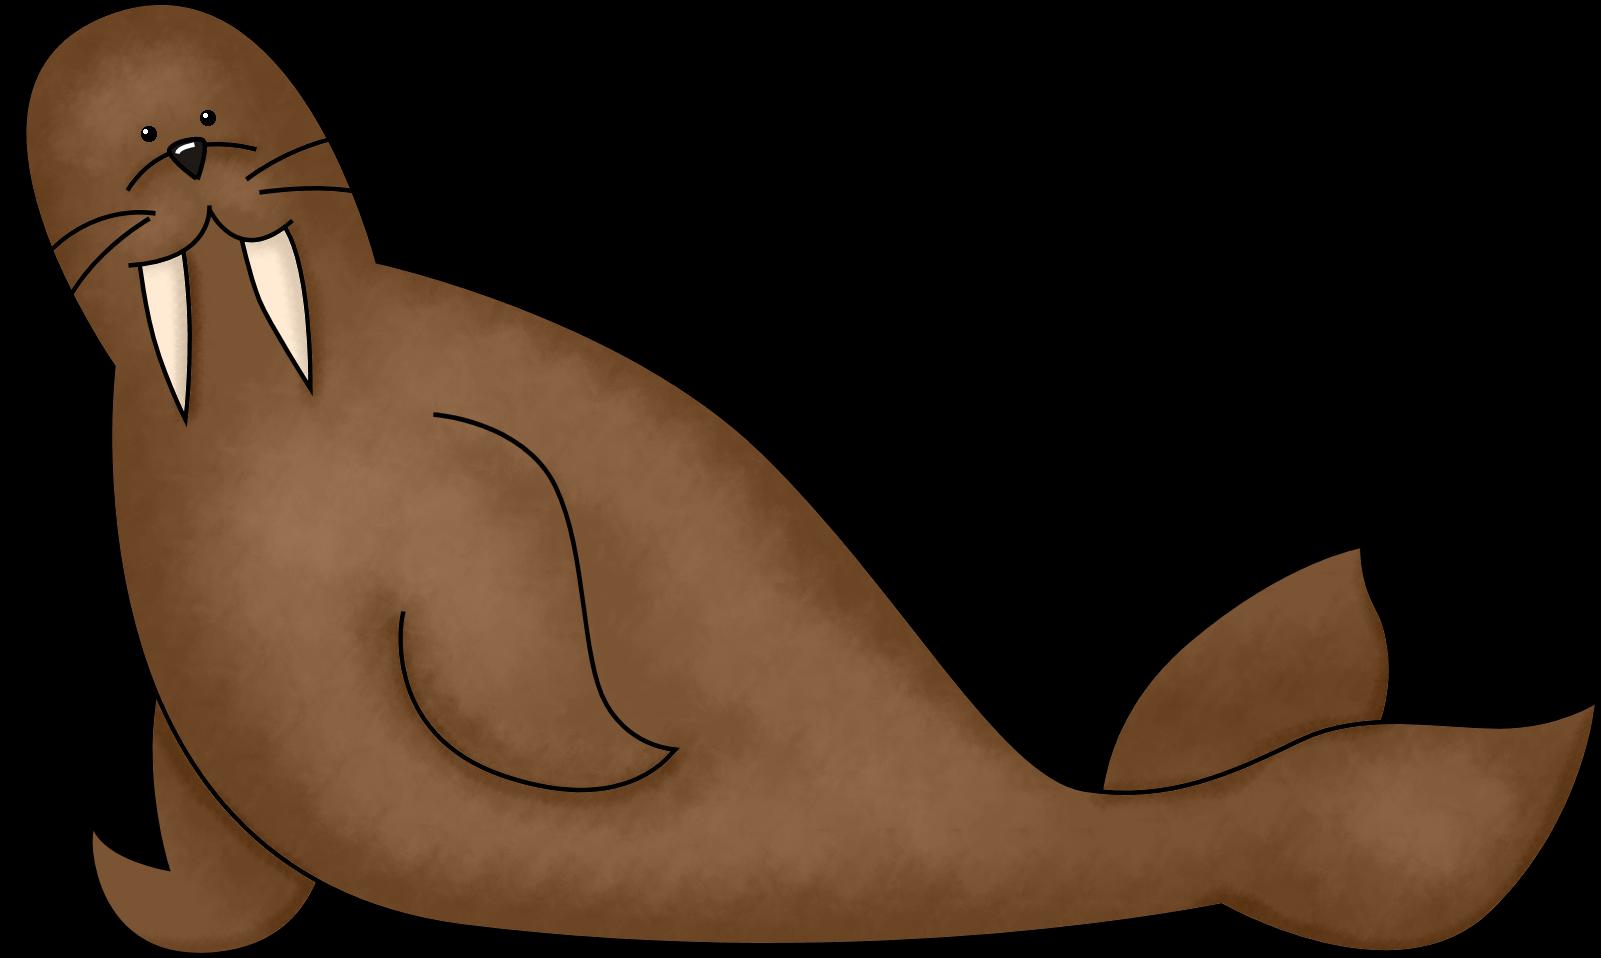 Walrus clip art free clipart images 3